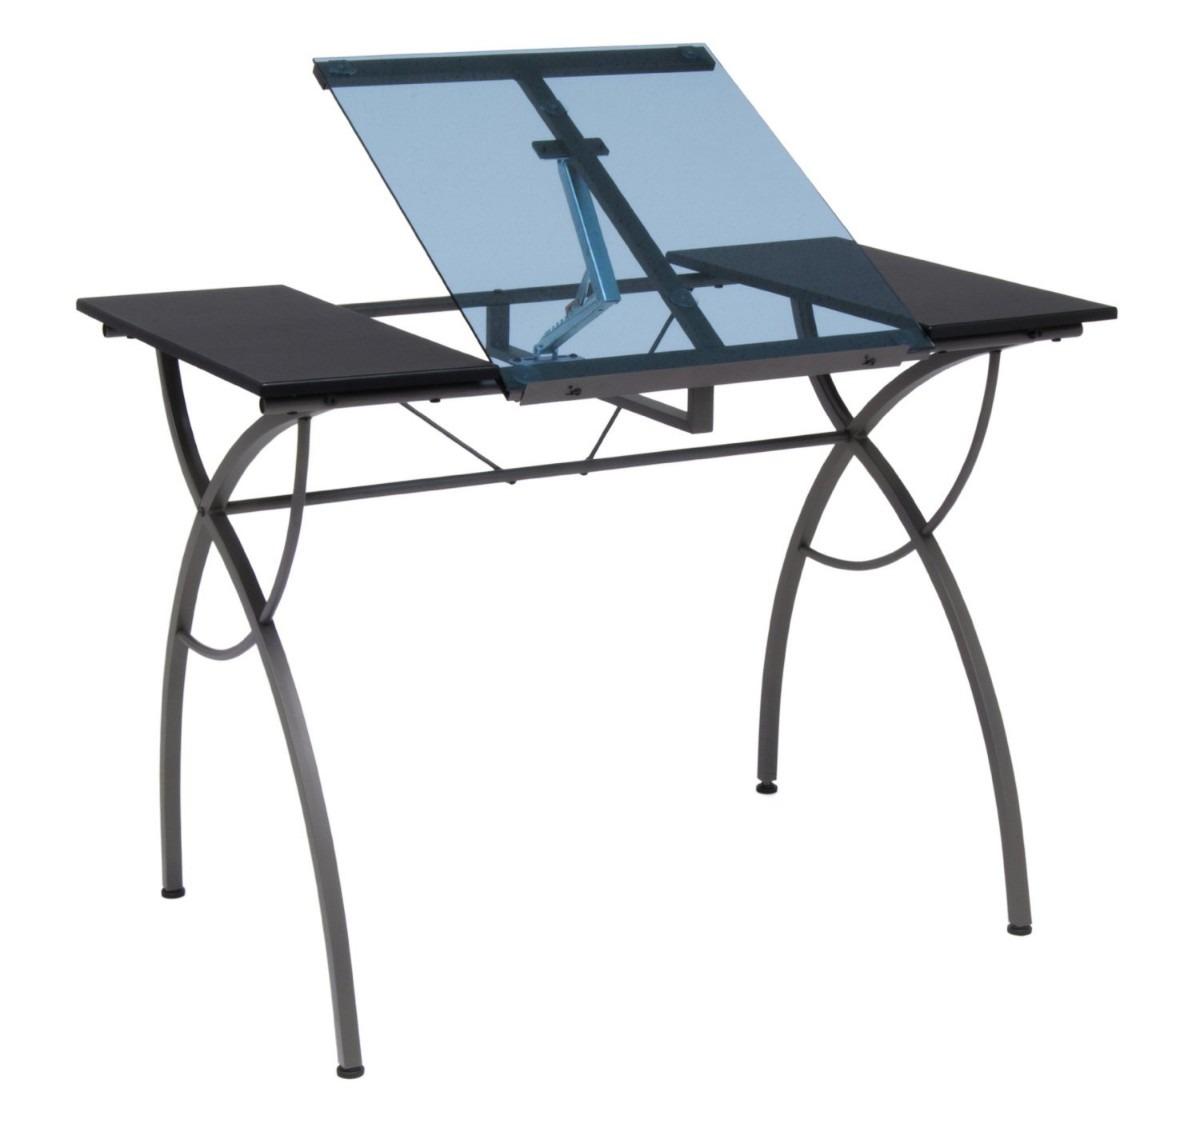 Mesa para dibujo cristal escritorio dibujar ajustable vbf for Mesas de dibujo baratas